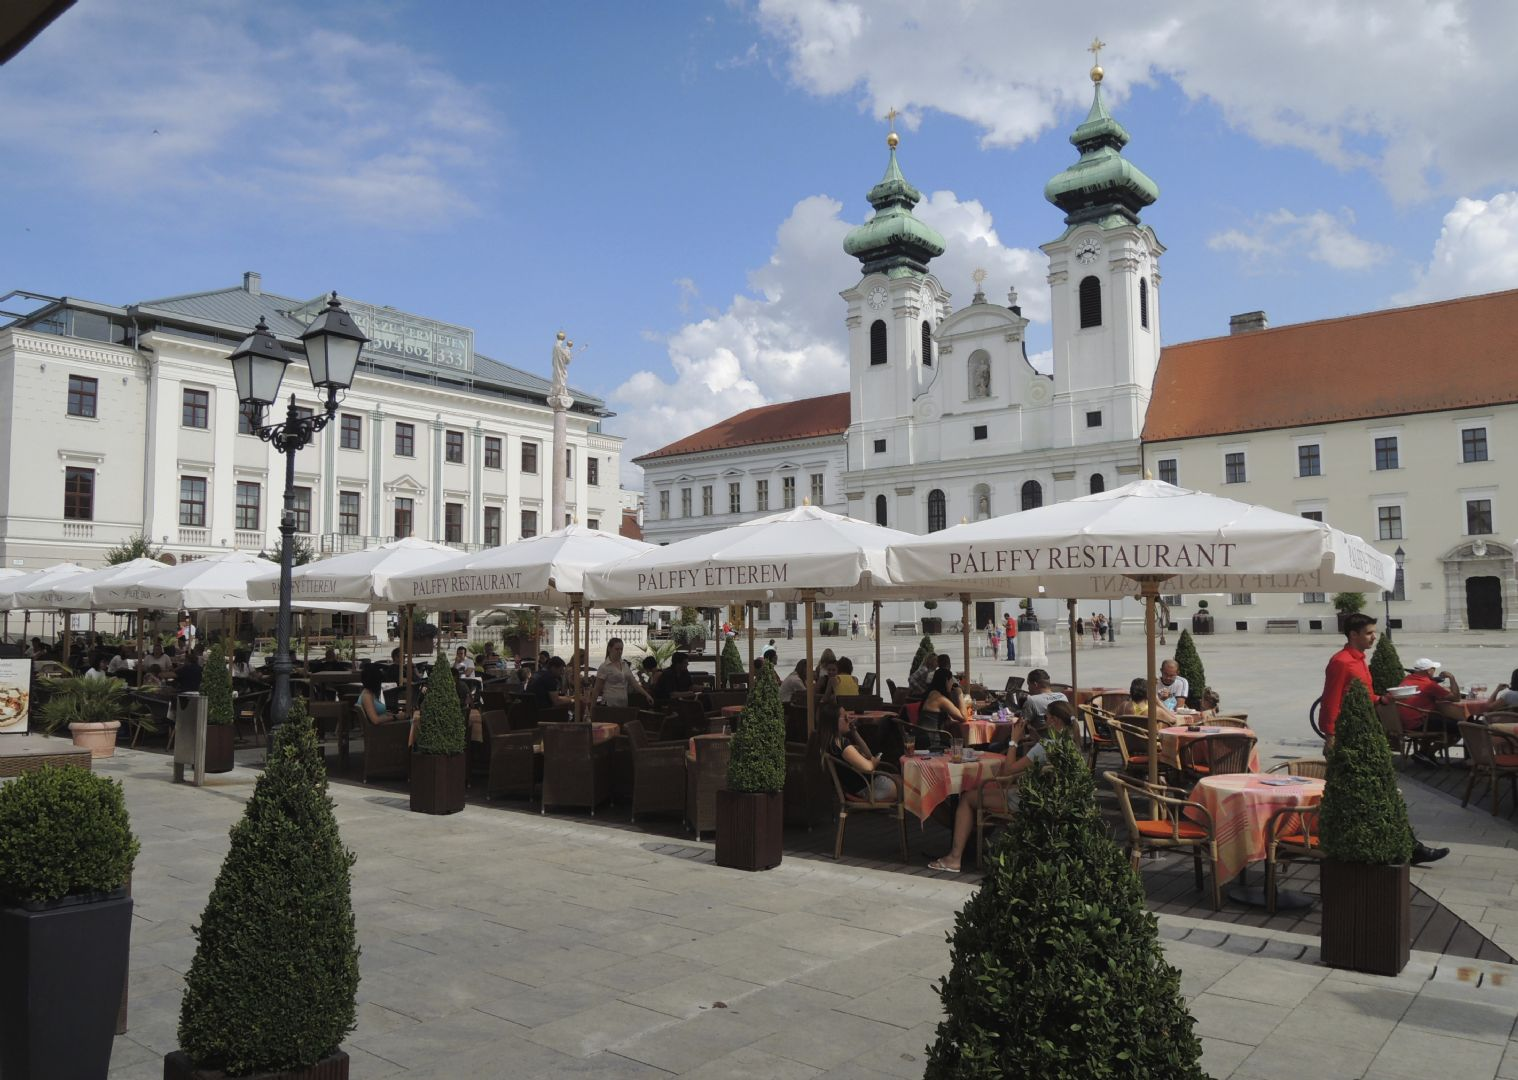 Viennatobudapest1.jpg - Austria, Slovakia and Hungary - Vienna to Budapest - Self-Guided Family Cycling Holiday - Family Cycling